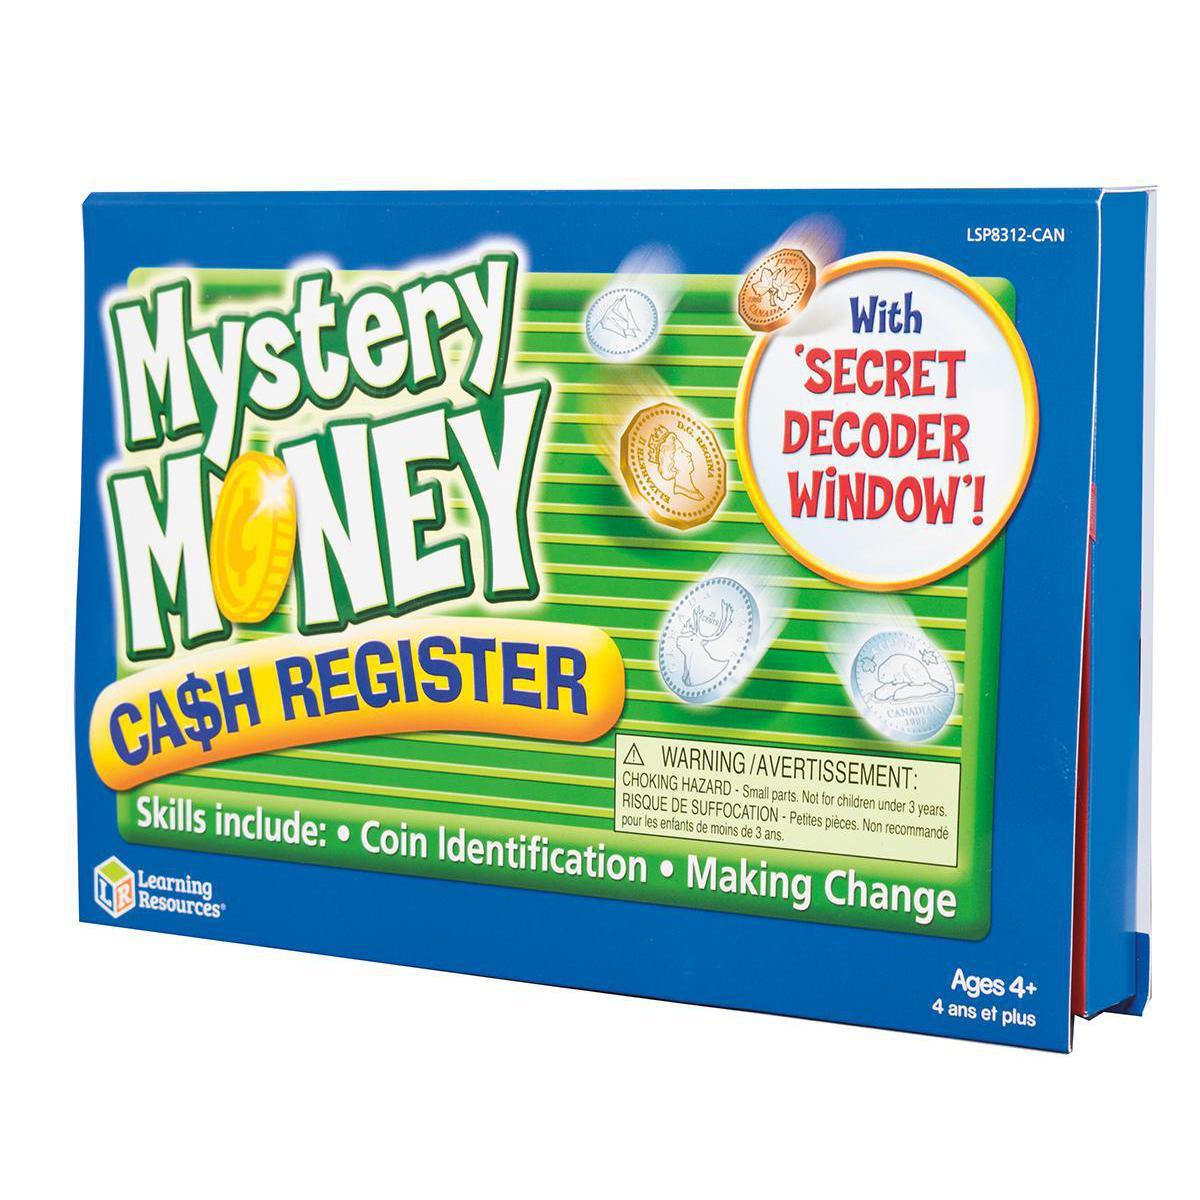 Canadian Mystery Money Cash Register